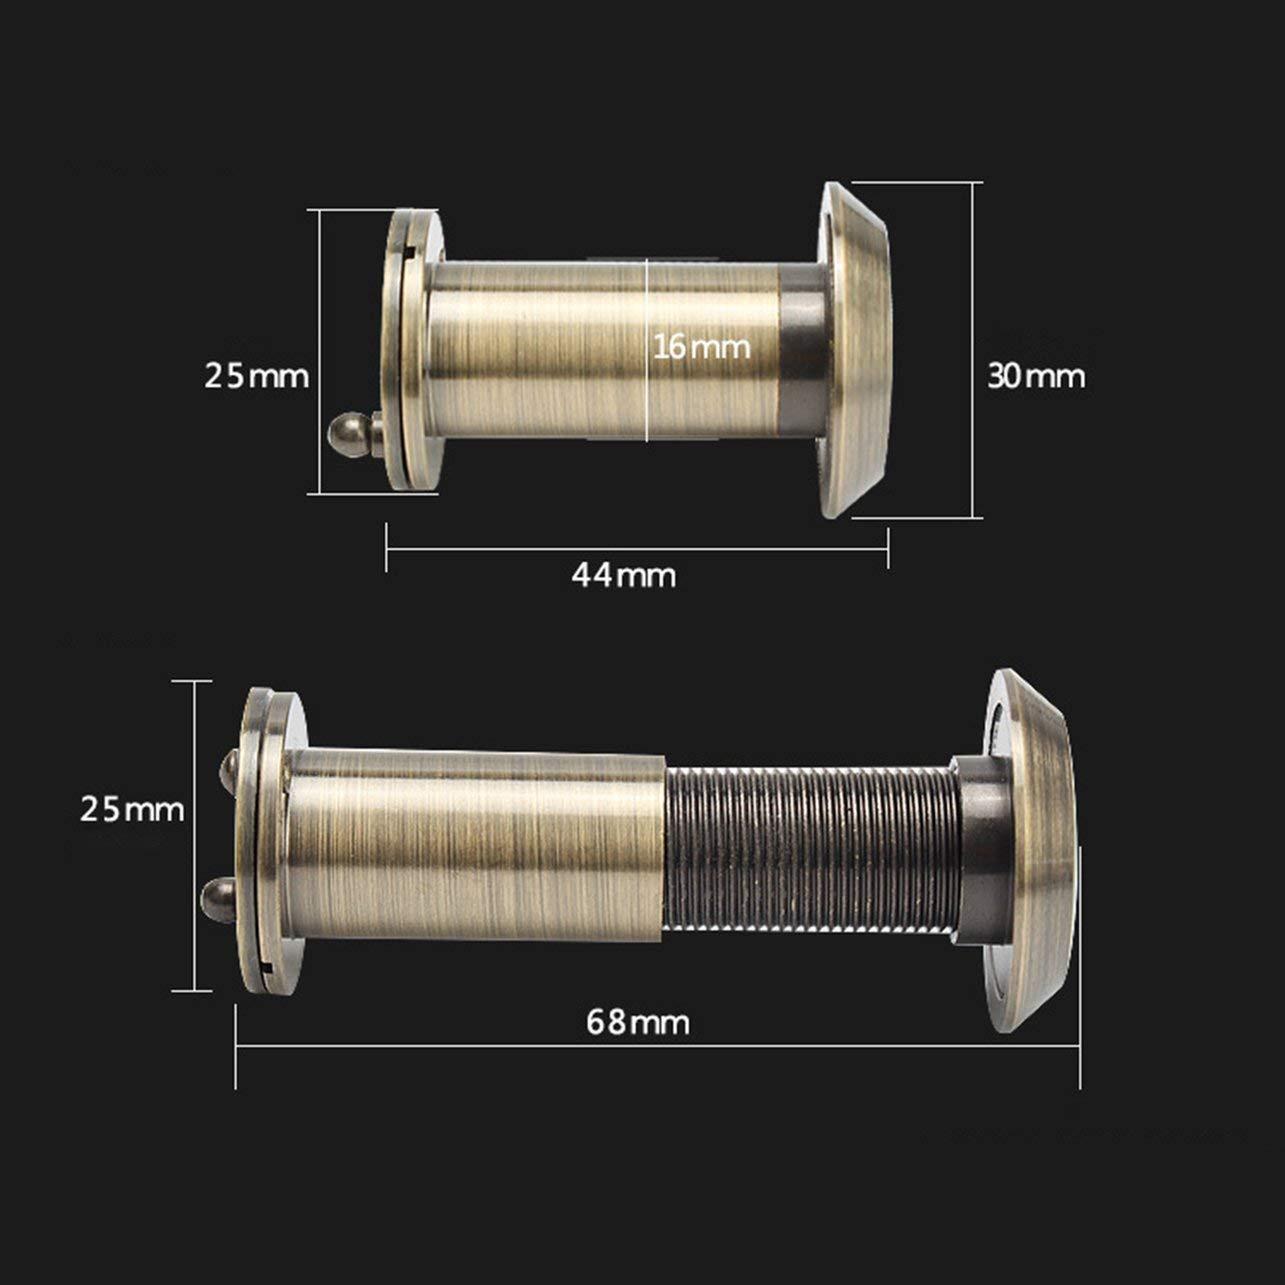 WOSOSYEYO Seguridad para el hogar 200 Grados 35-55mm Puerta Alcance Mirilla Visor Mirada Agujero Gran Angular Retr/áctil Mirada Segura